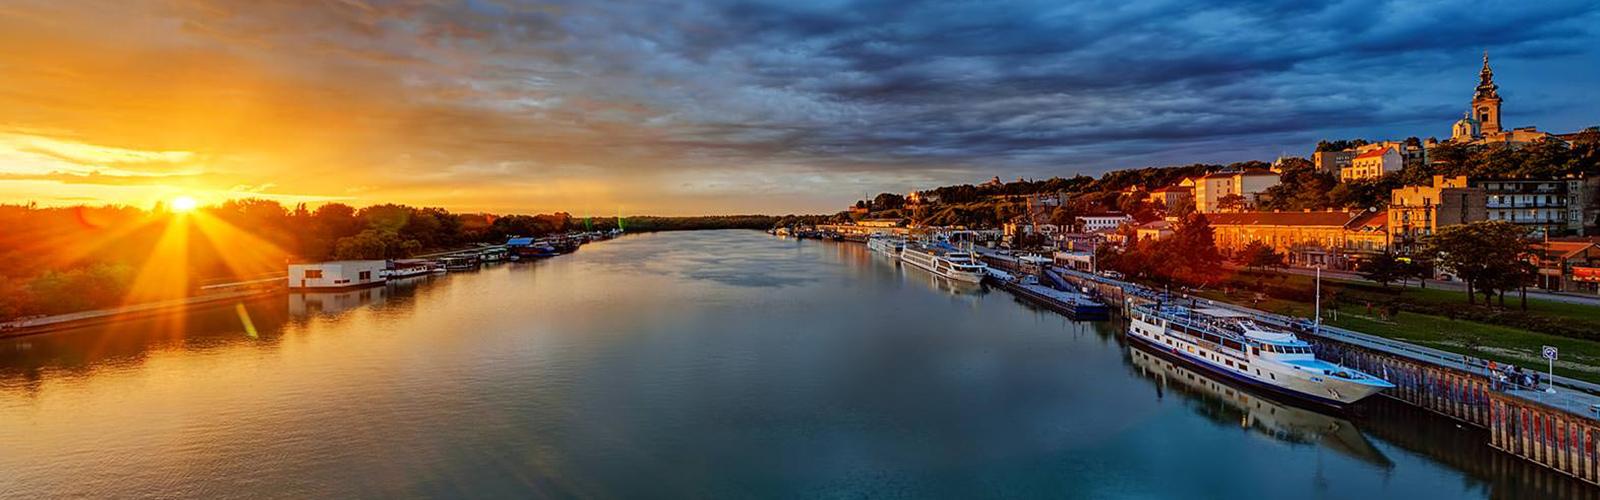 Concierge Belgrade | Package Belgrade on the river